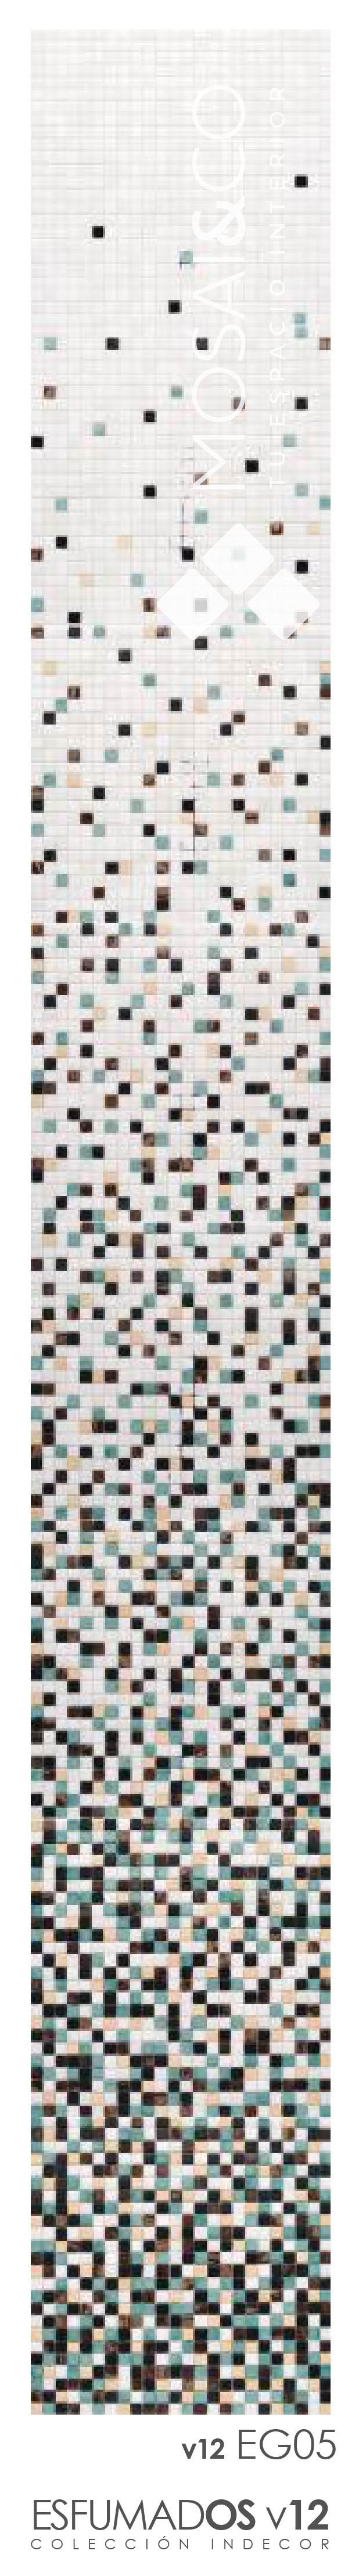 Esfumados-mosaico-v12-eg05-mosaiandco